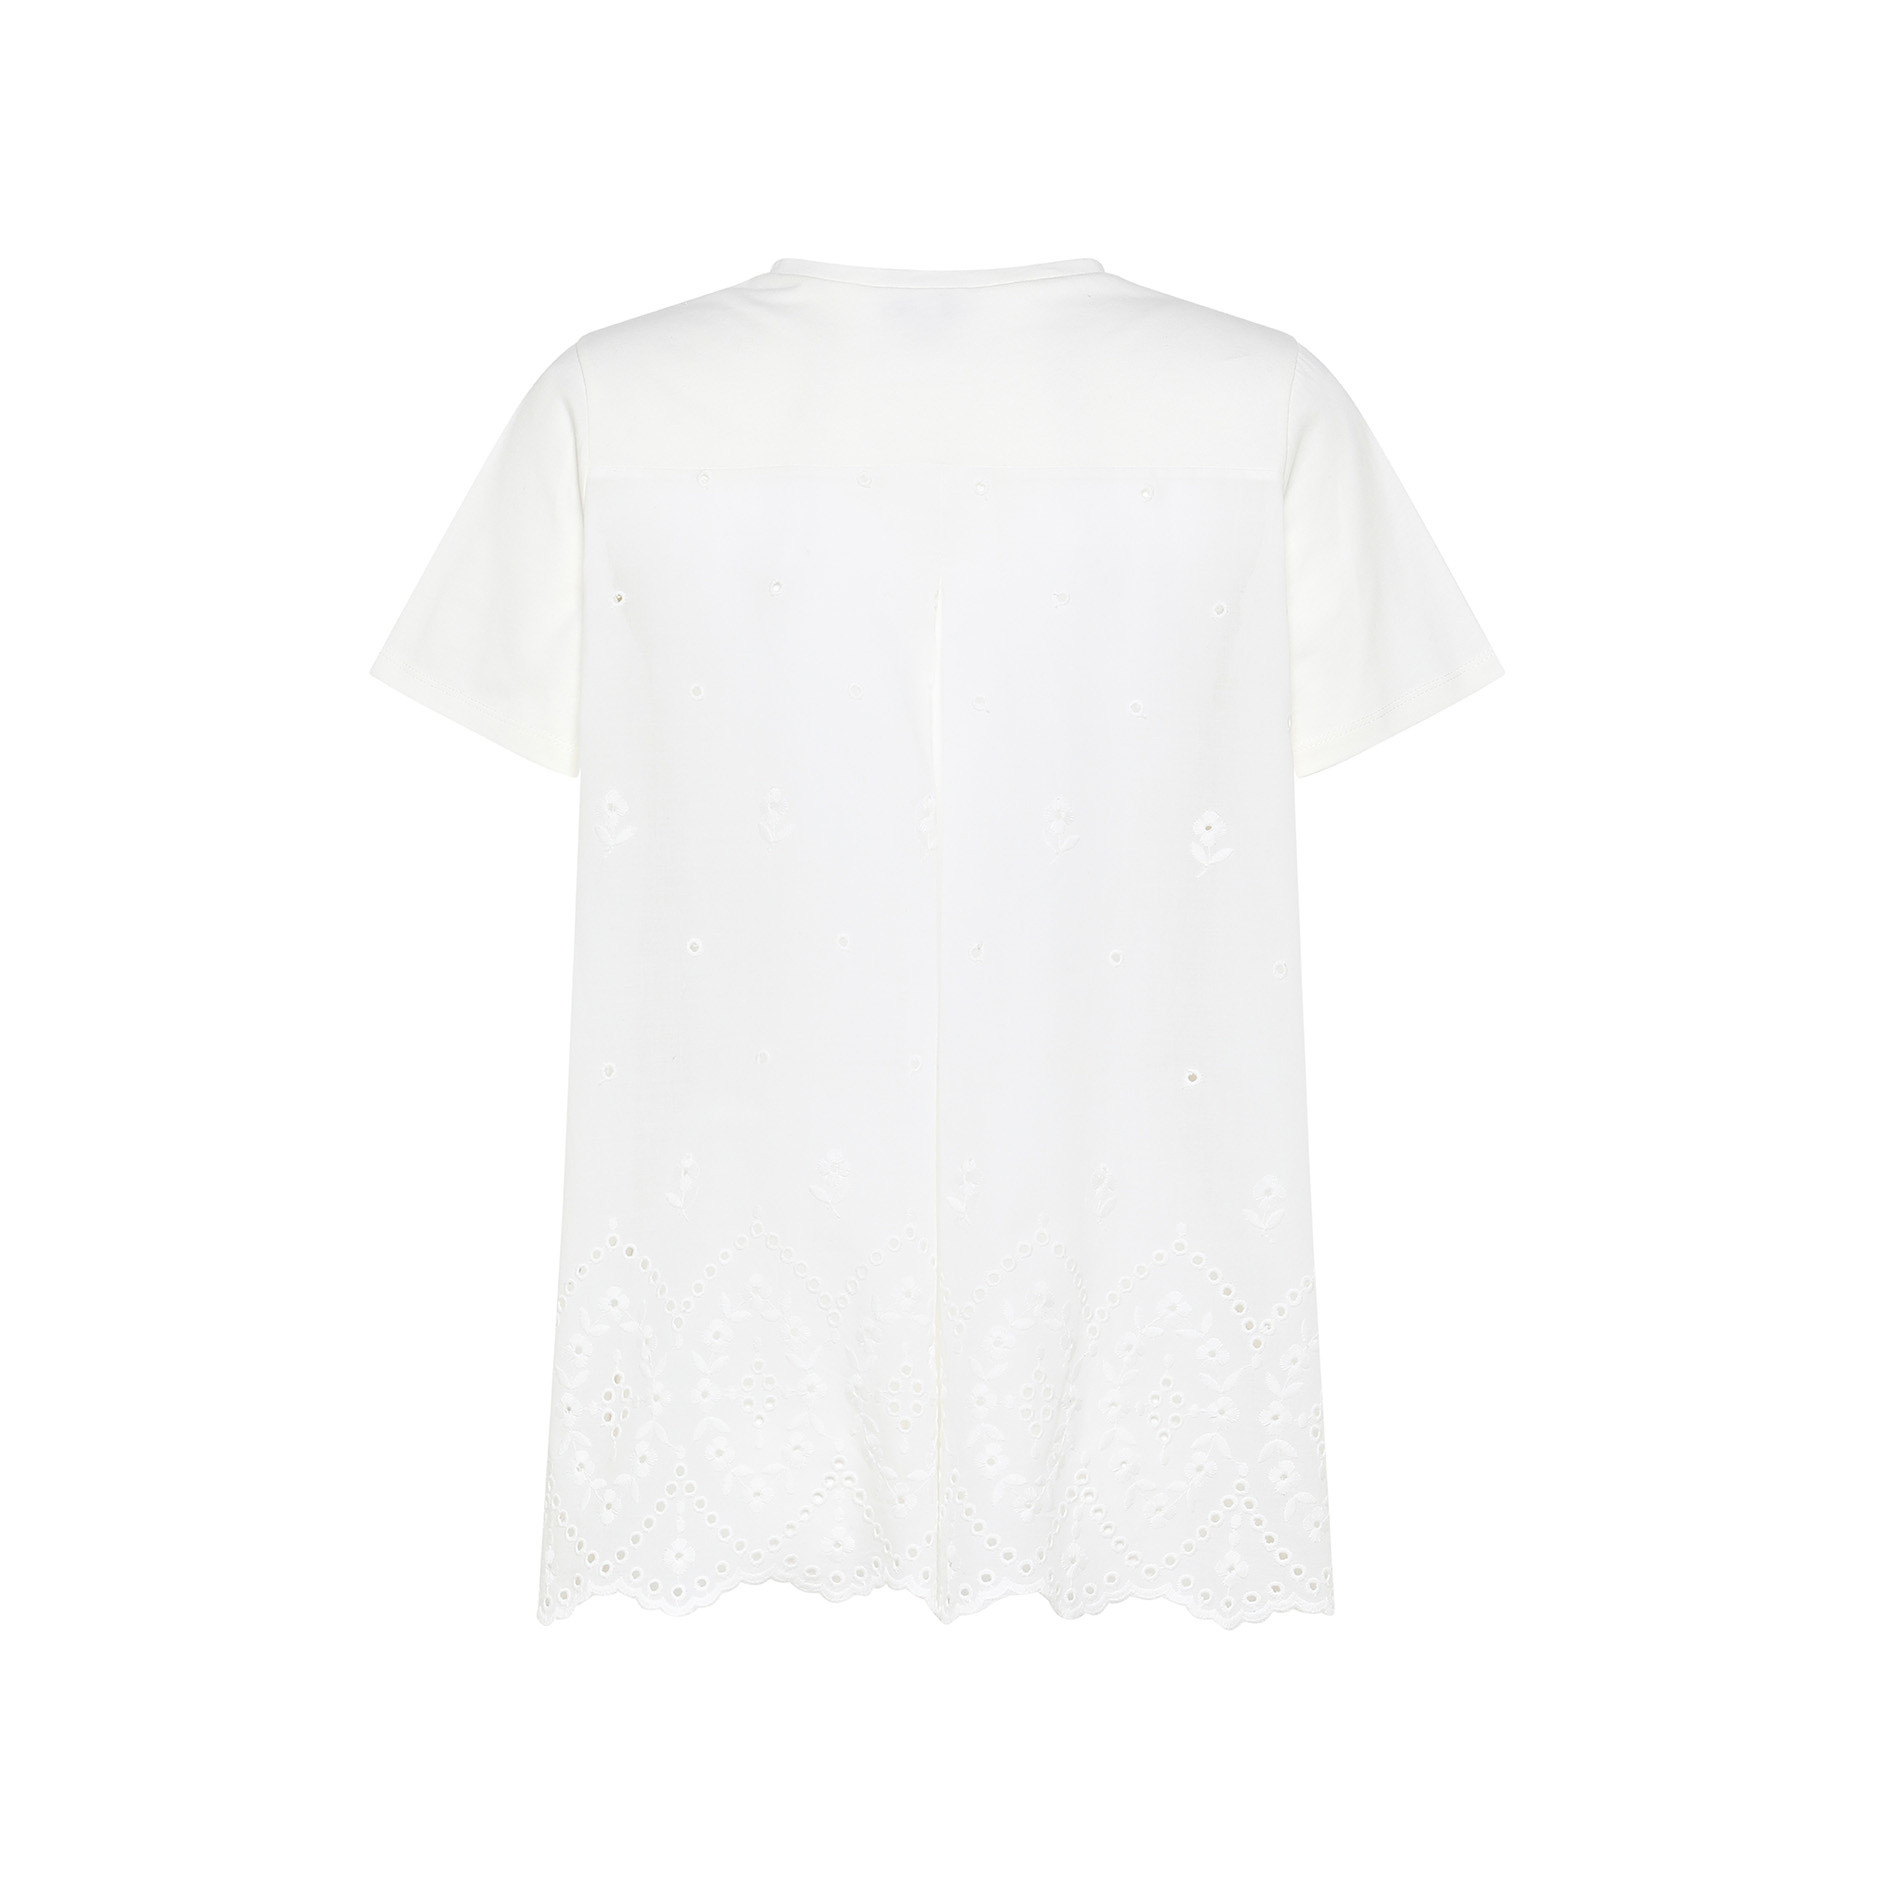 T-shirt in cotone e sangallo tinta unita, Bianco, large image number 1